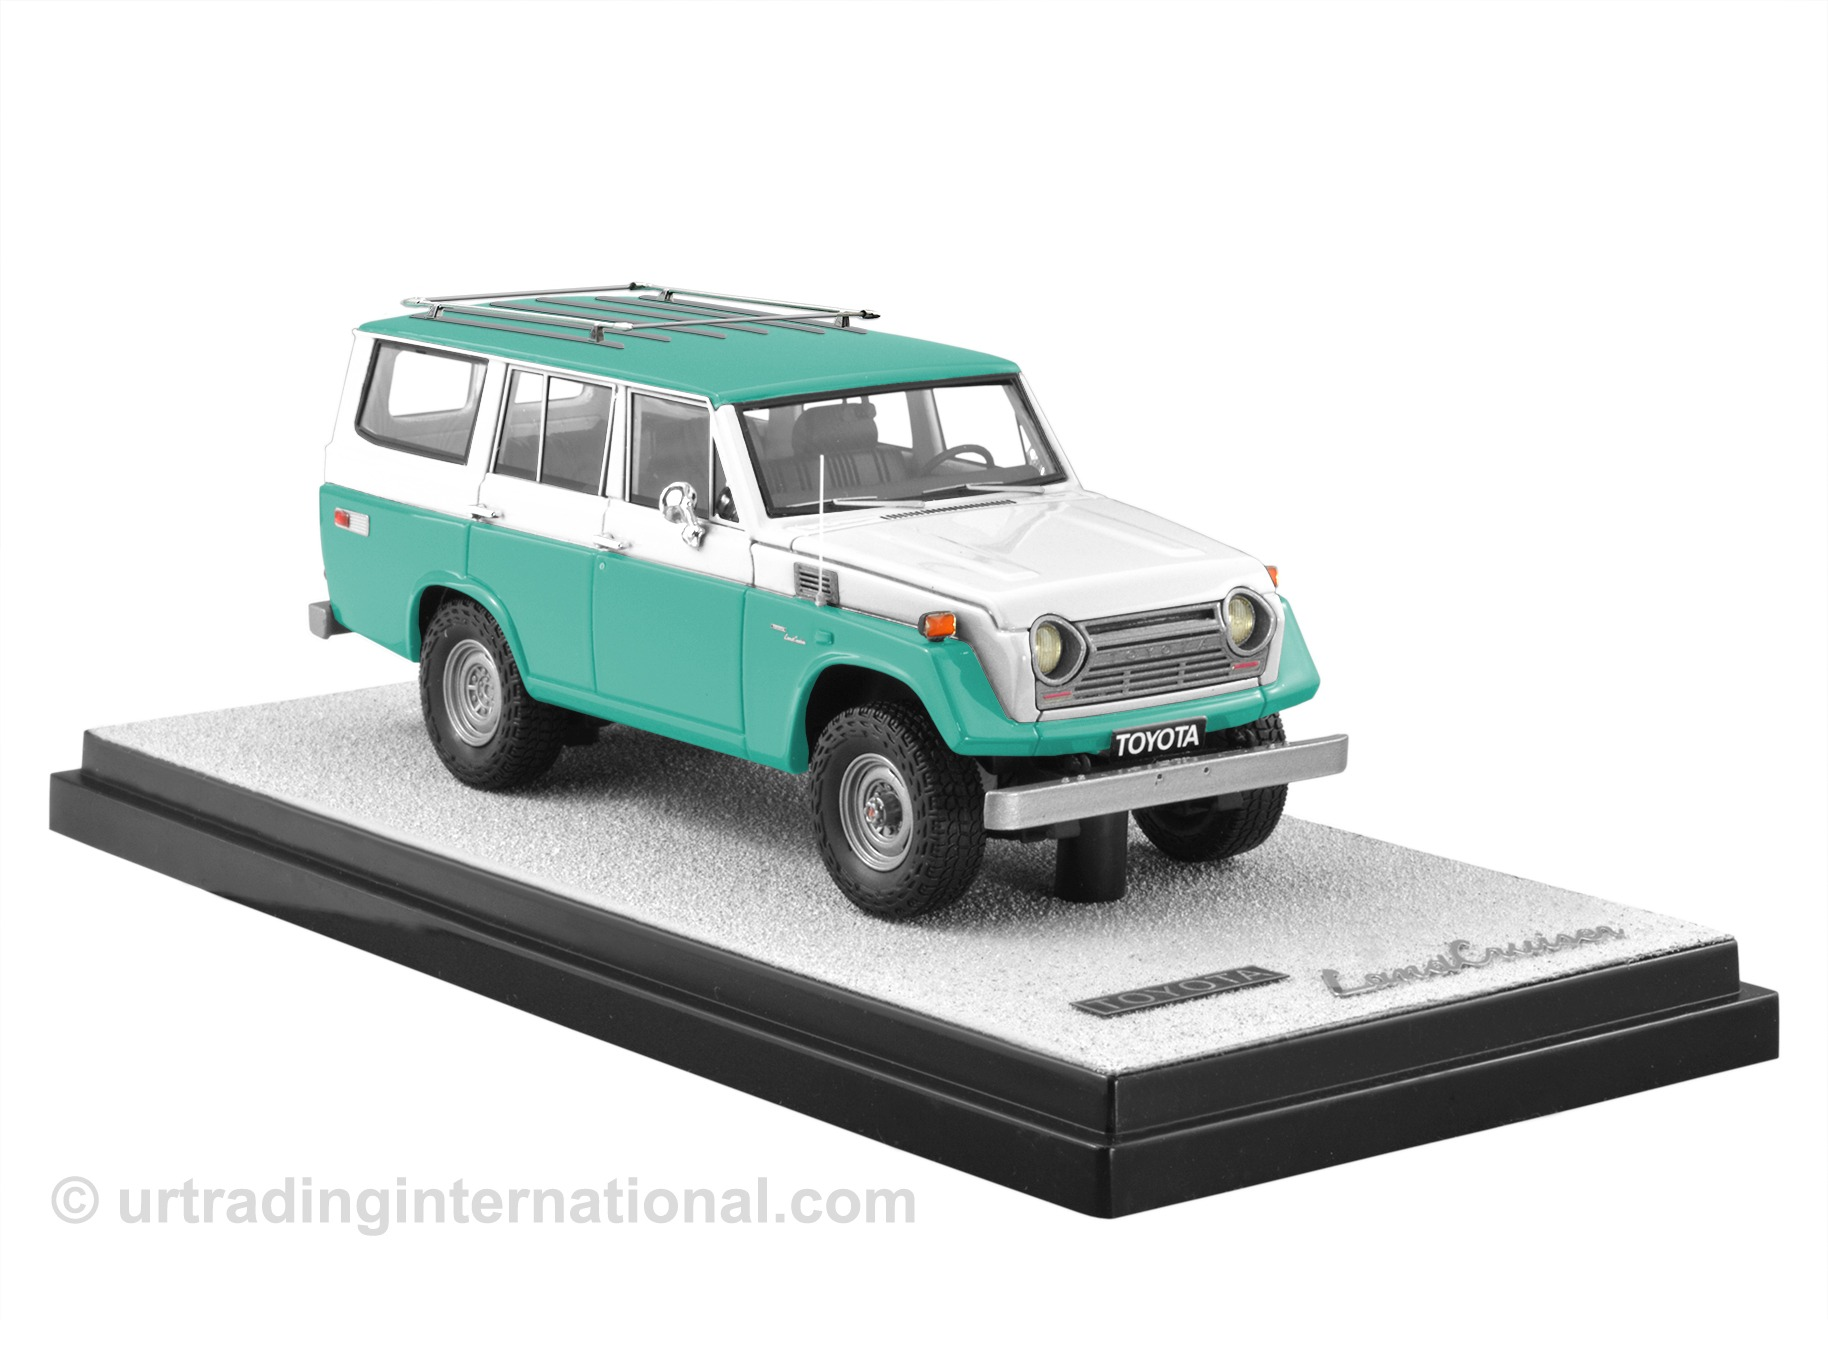 1974 Toyota Land Cruiser FJ55 – Green/White LHD